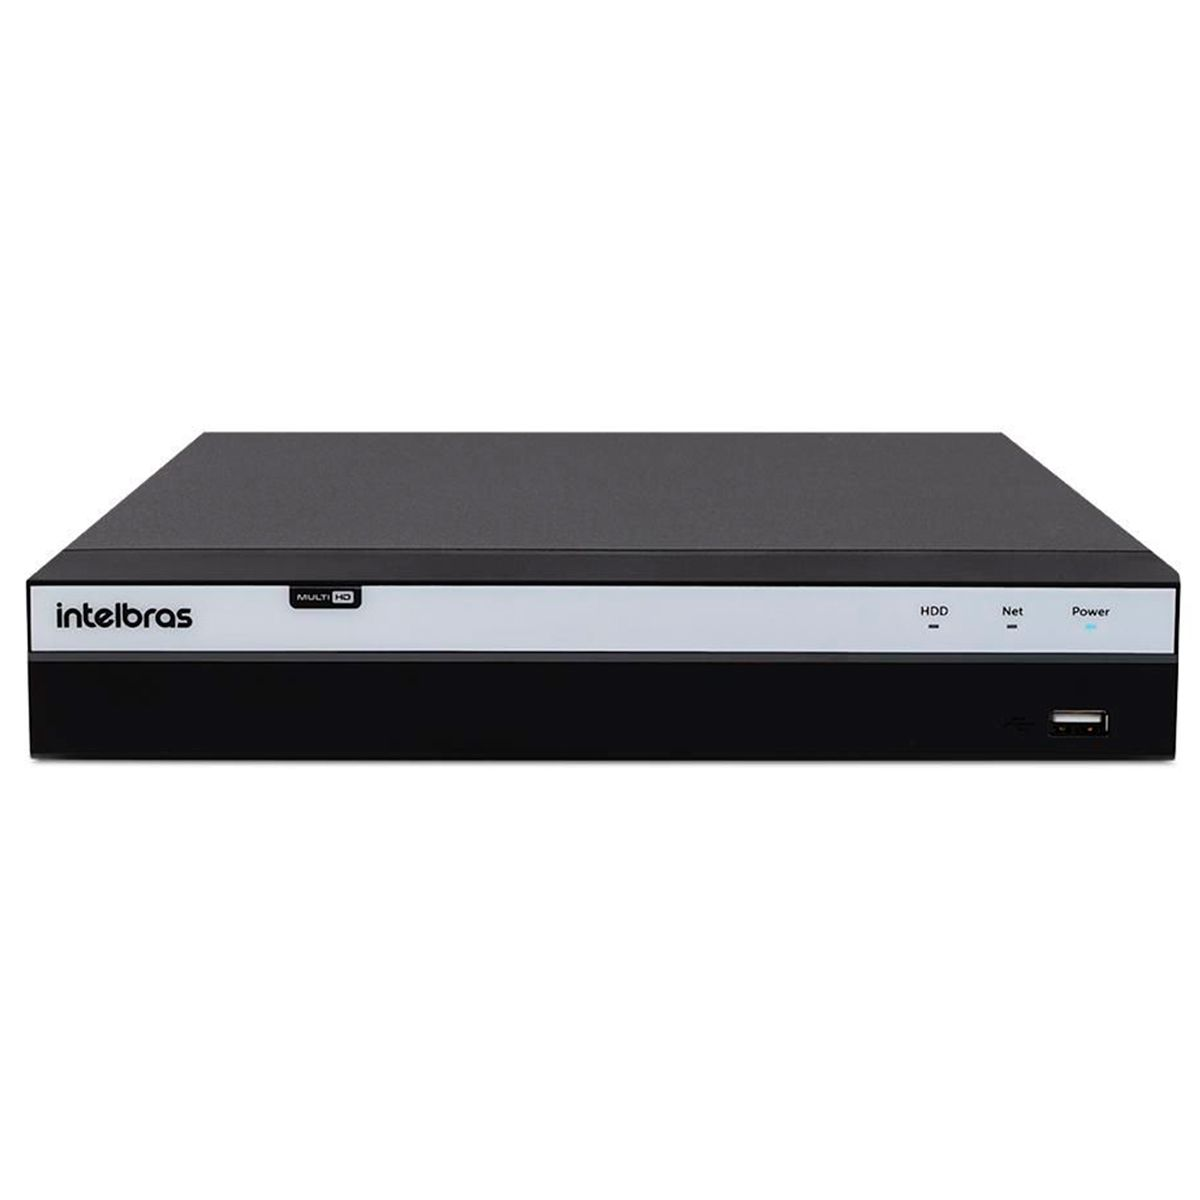 Kit 10 Câmeras de Segurança Full HD 1080p Intelbras VHD 3230 G4 + DVR Intelbras Full HD 16 Ch + Acessórios  - Tudo Forte